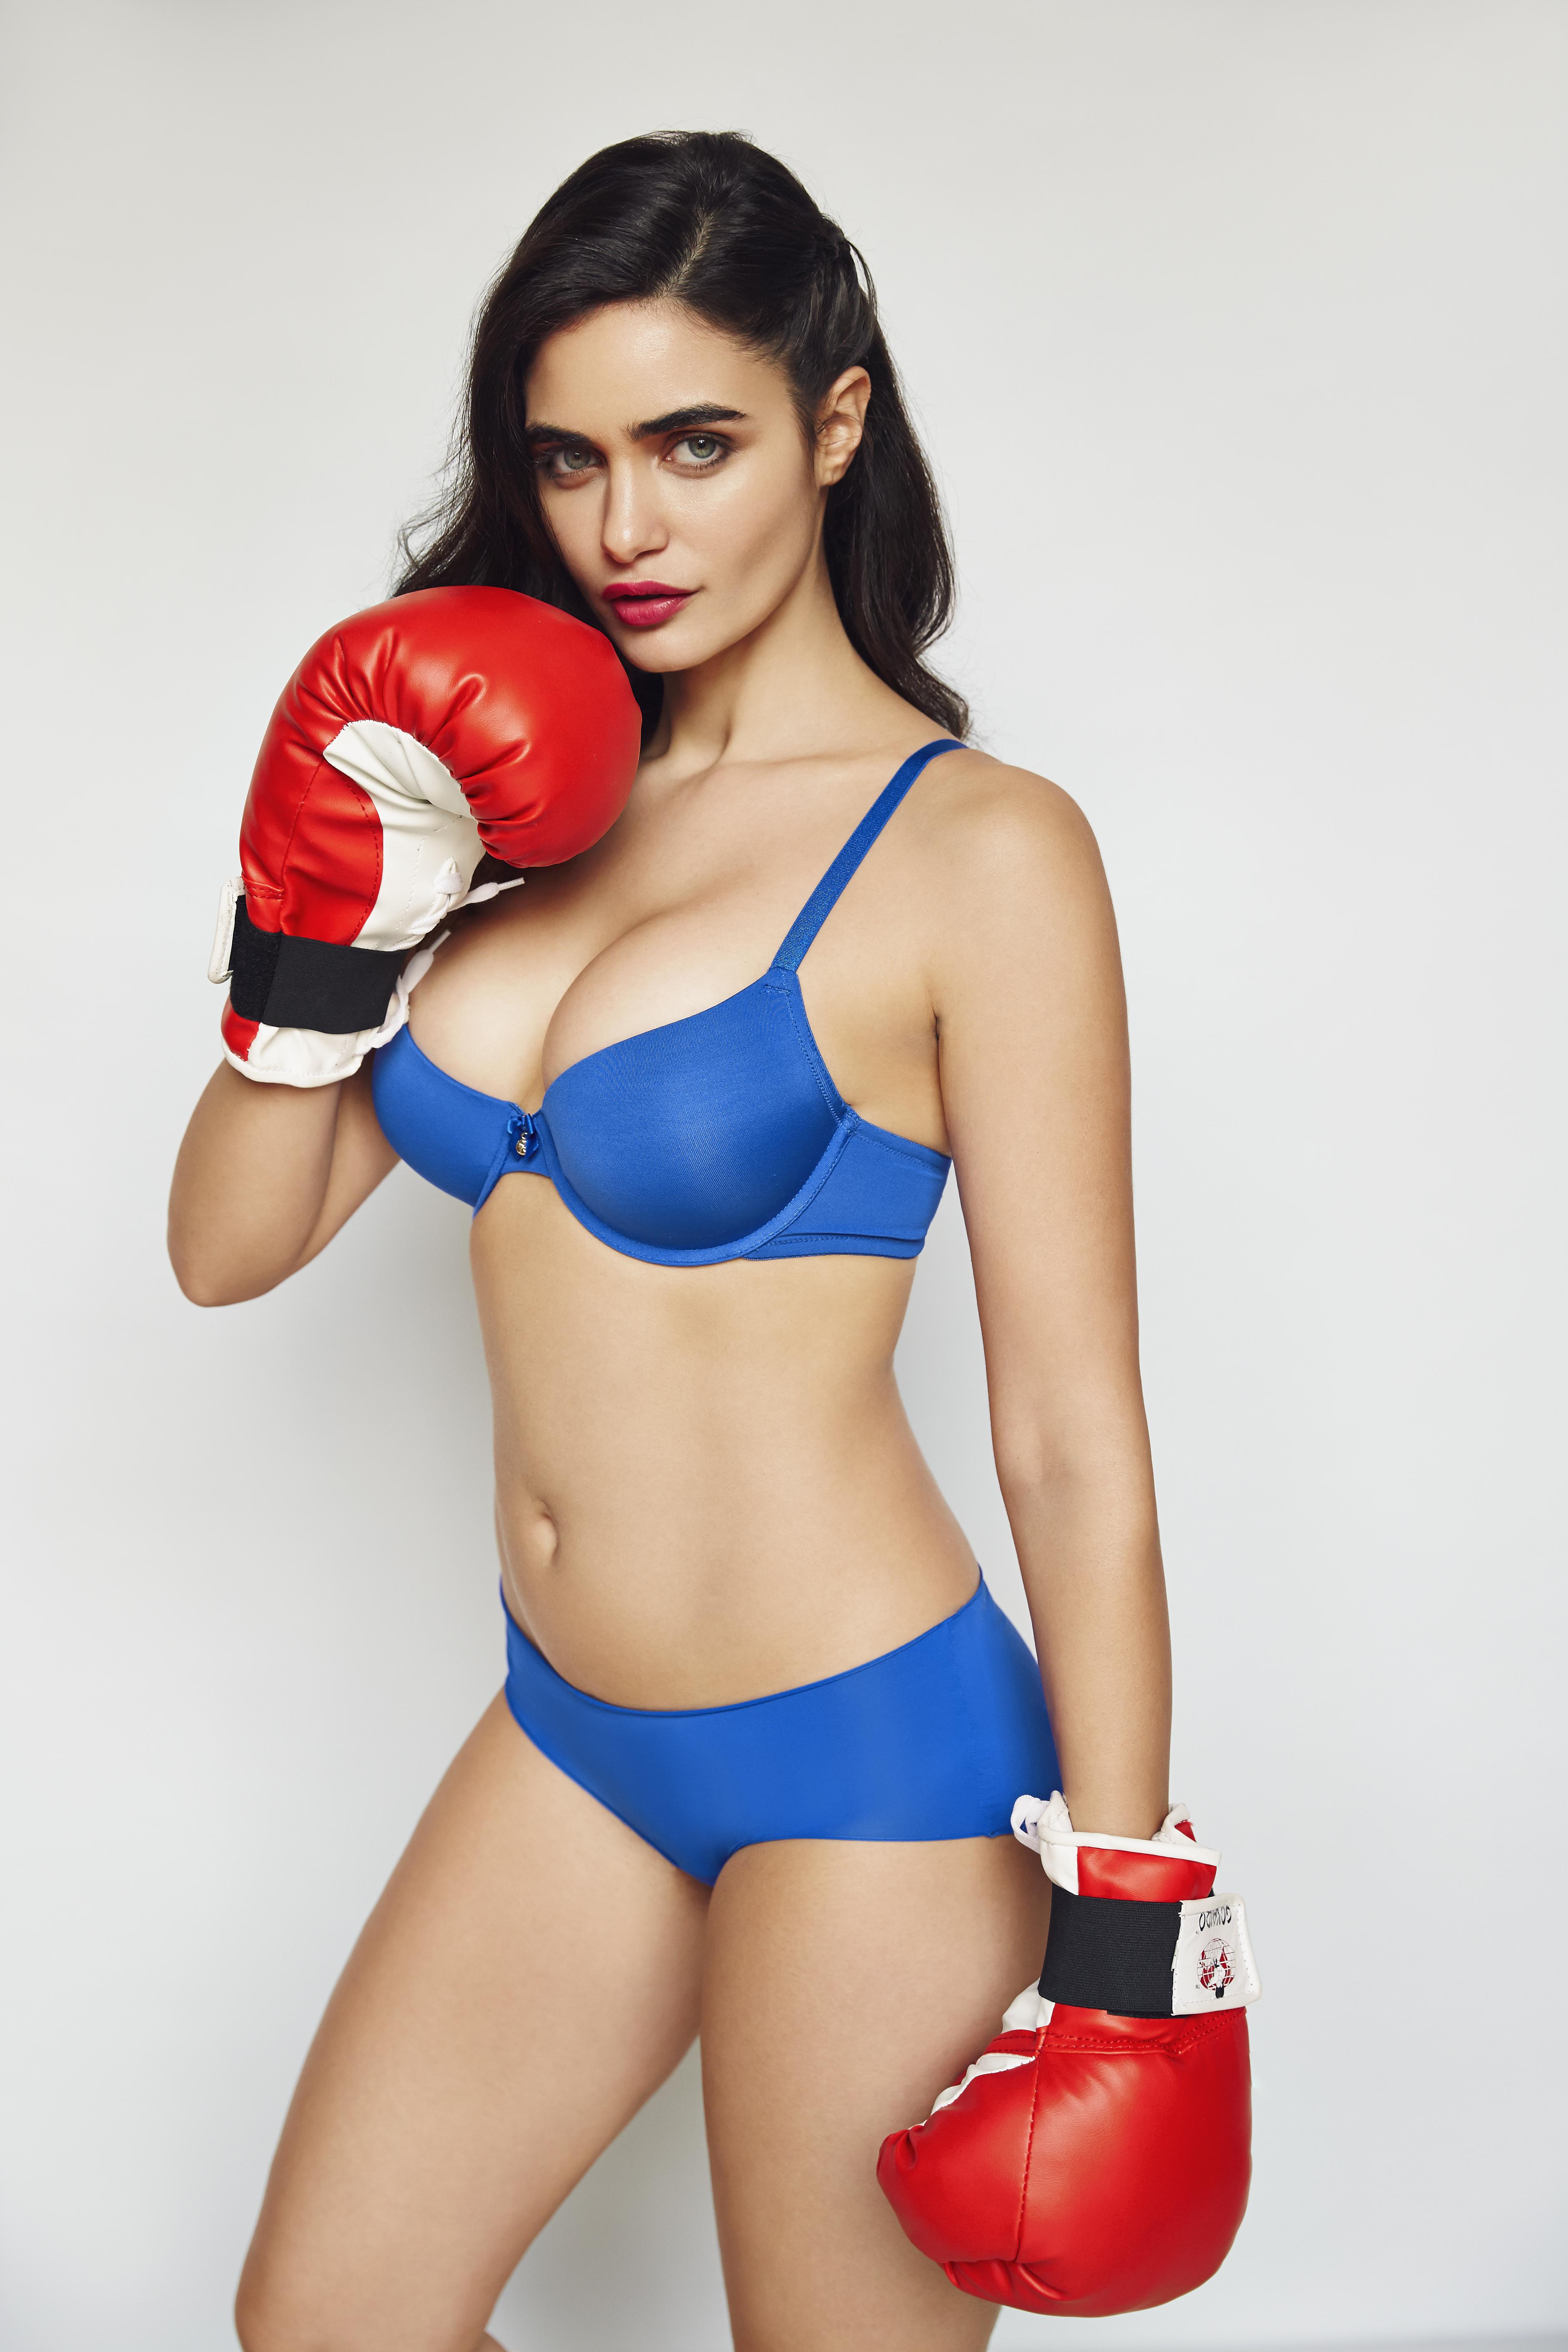 Myleene Klass Naked Photo Shoot To Promote New Fitness Dvd